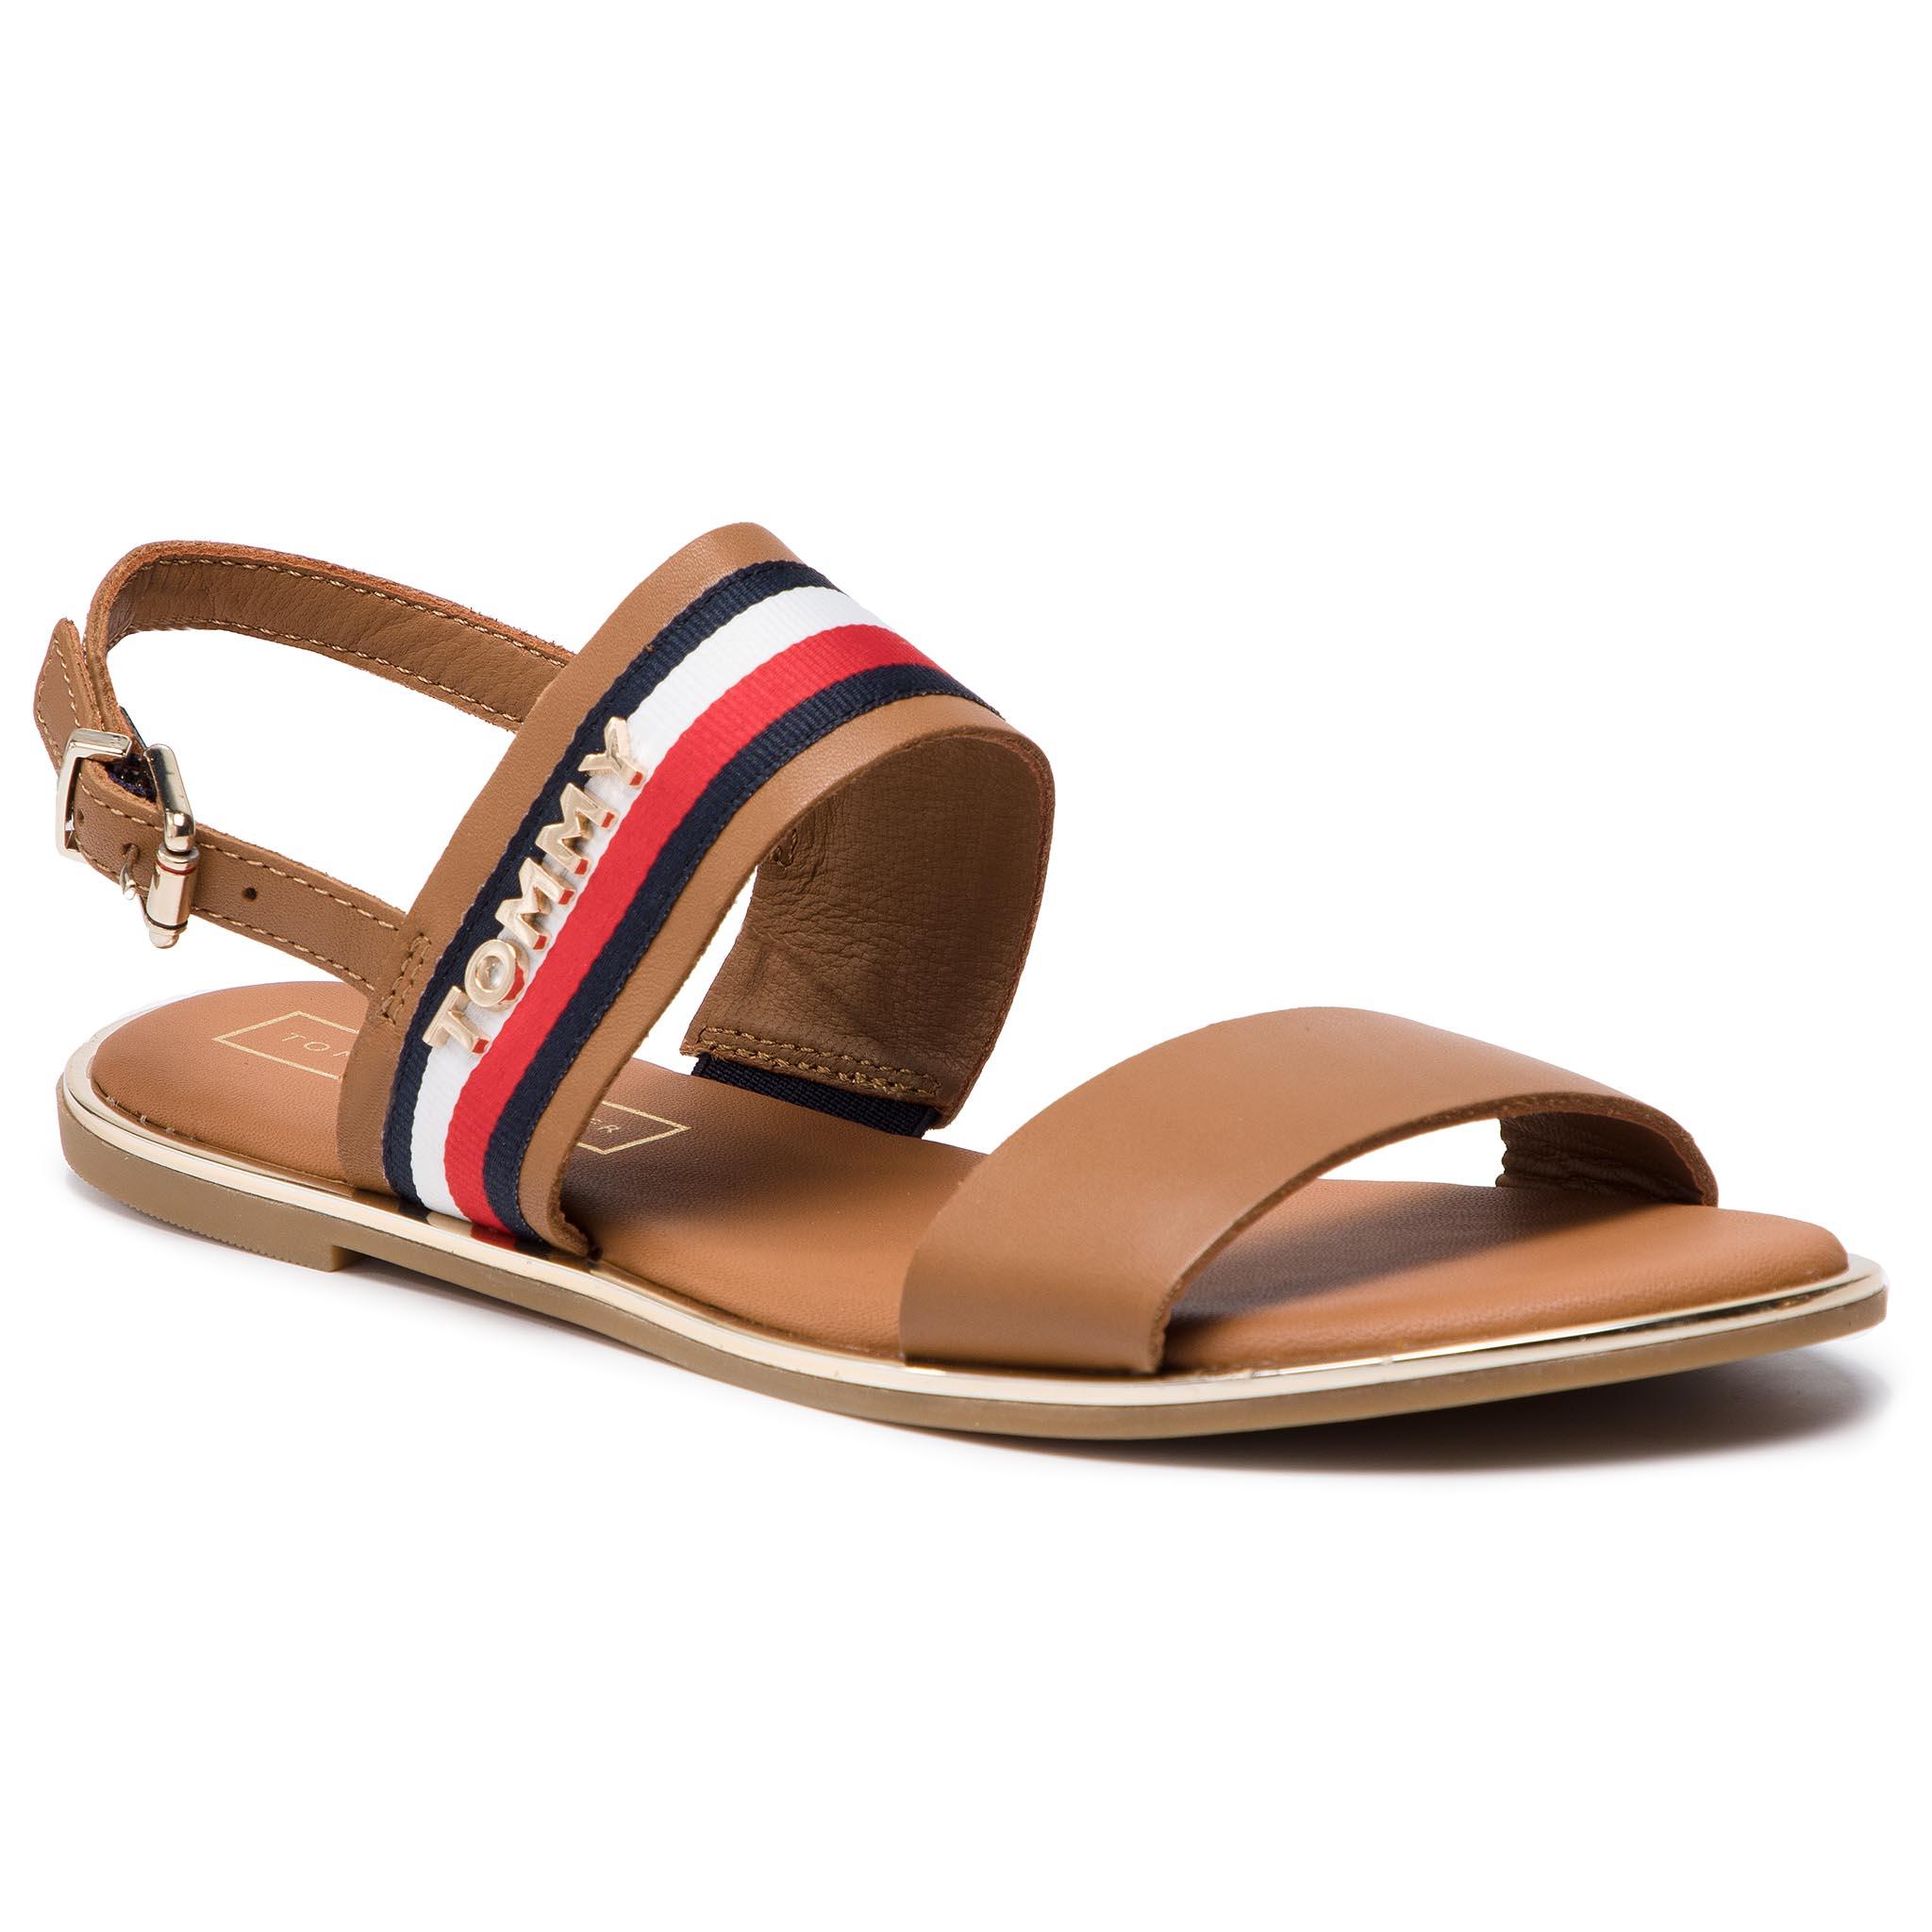 Sandále TOMMY HILFIGER - Flat Sandal Corporate Ribbon FW0FW04049 Summer Cognac 929